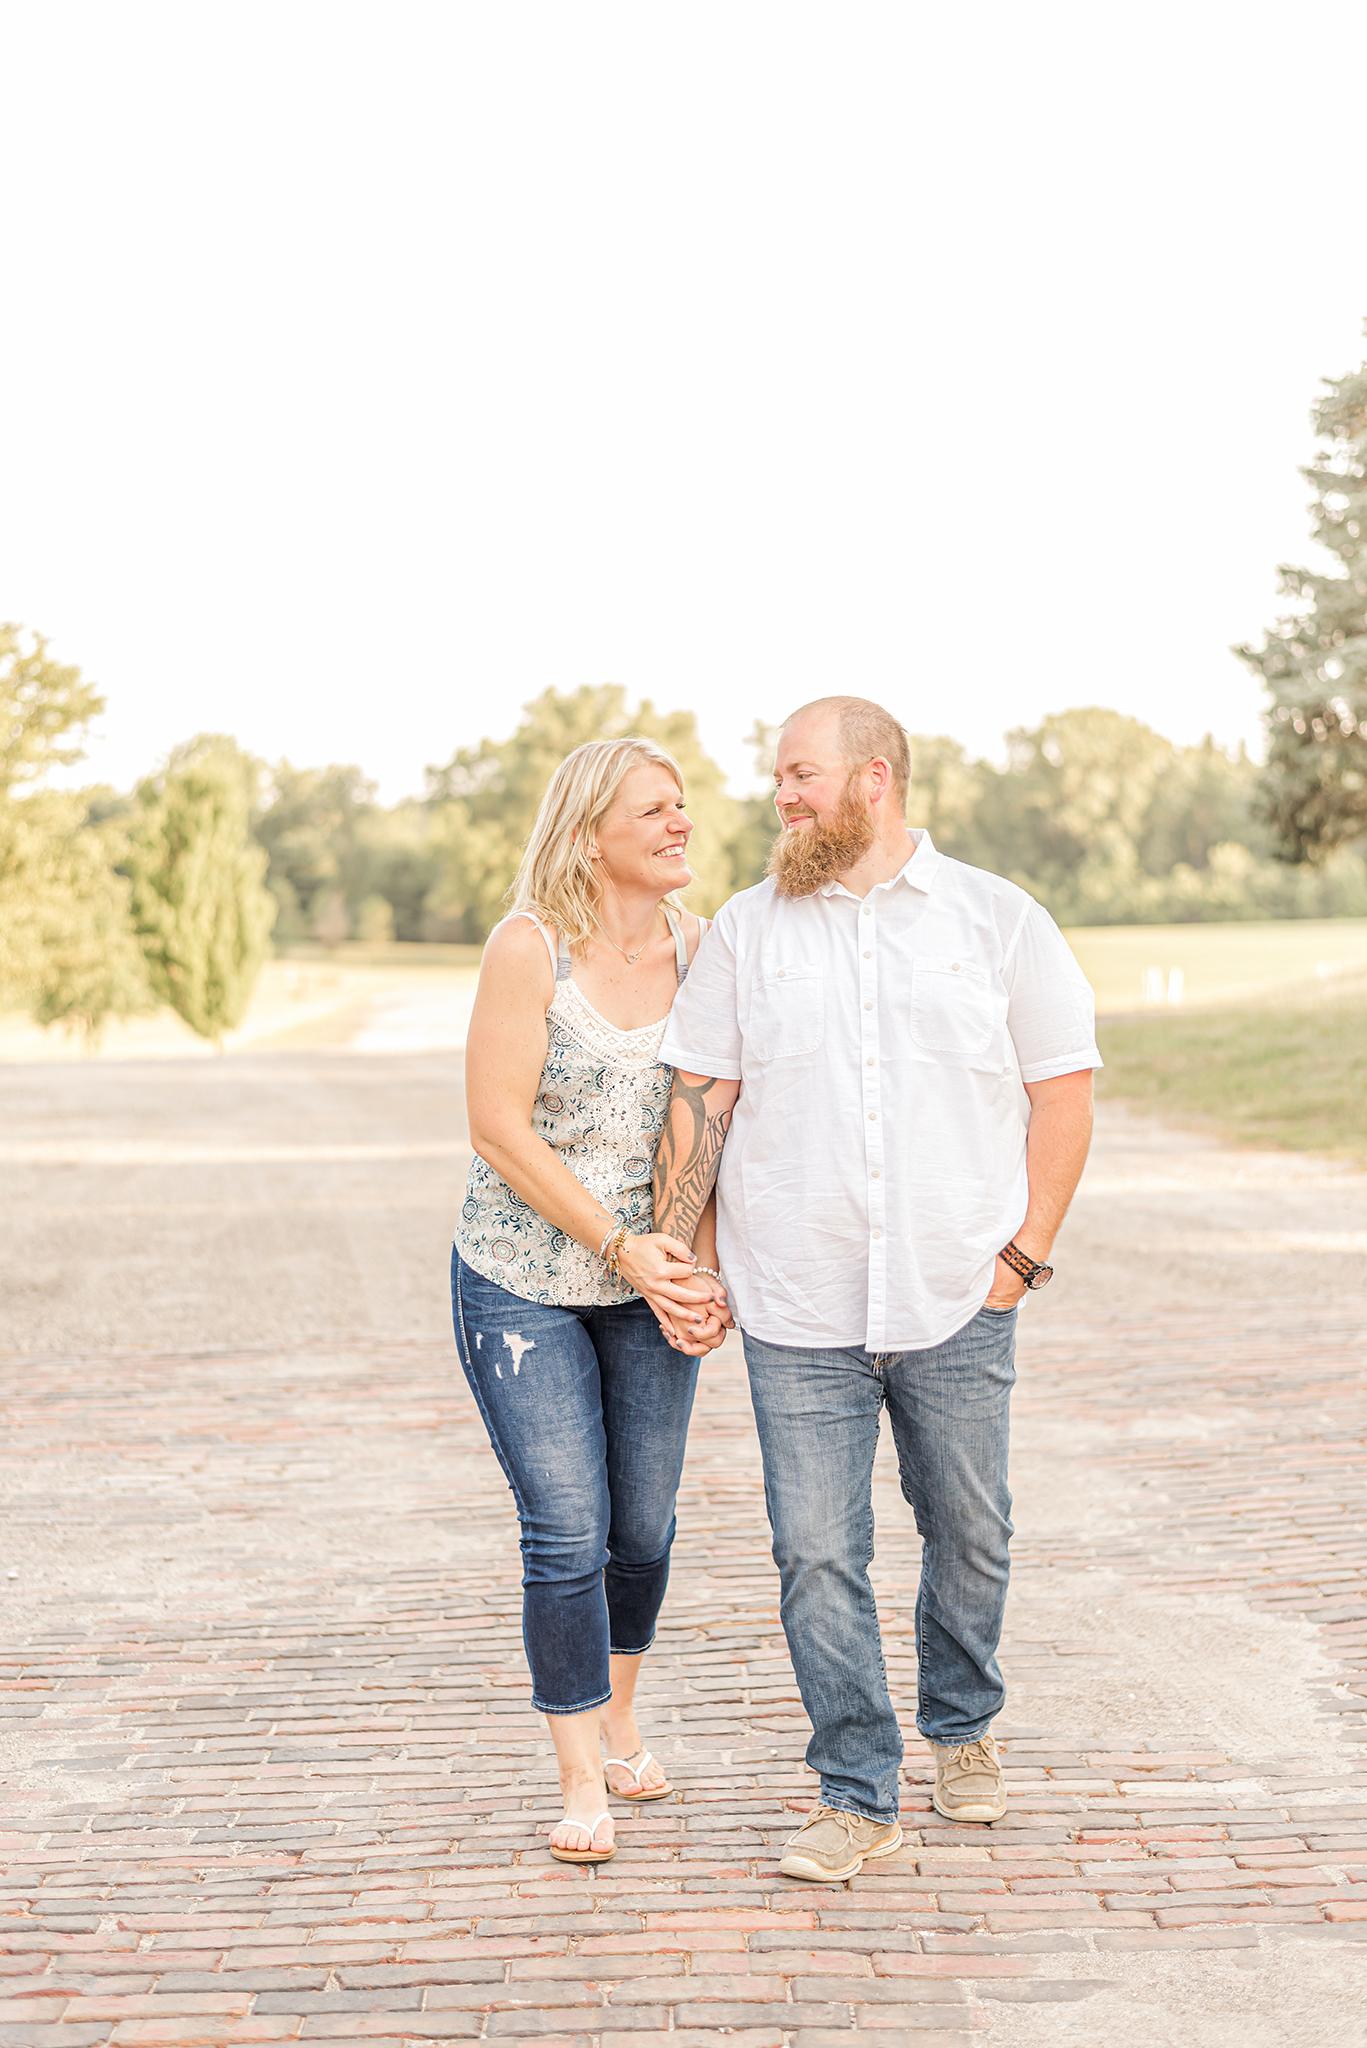 Lindsay-Adkins-Photography-Michigan-Engagement-And-Wedding-Photographer-3